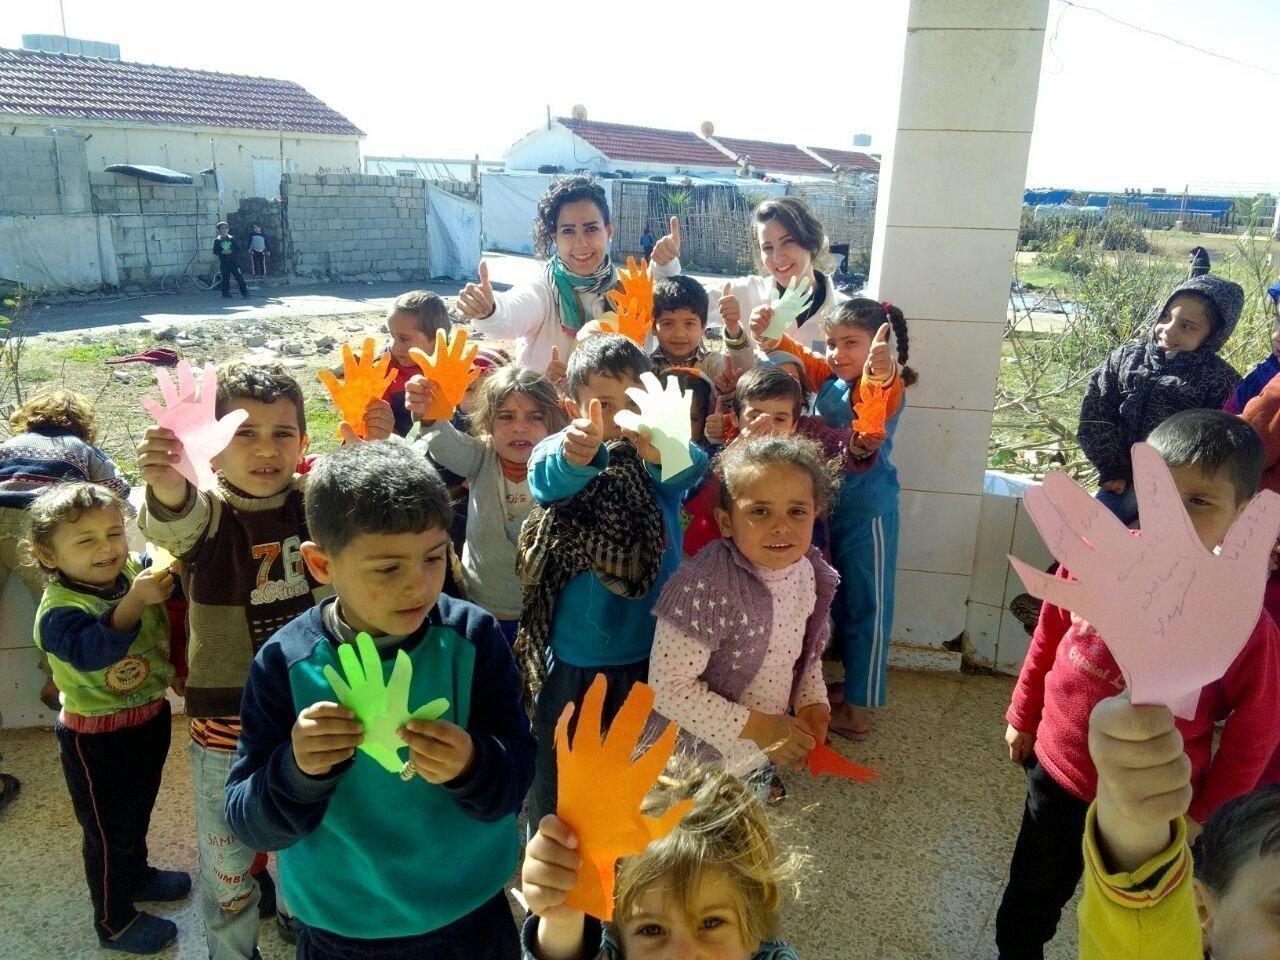 8 anni di guerra siriana